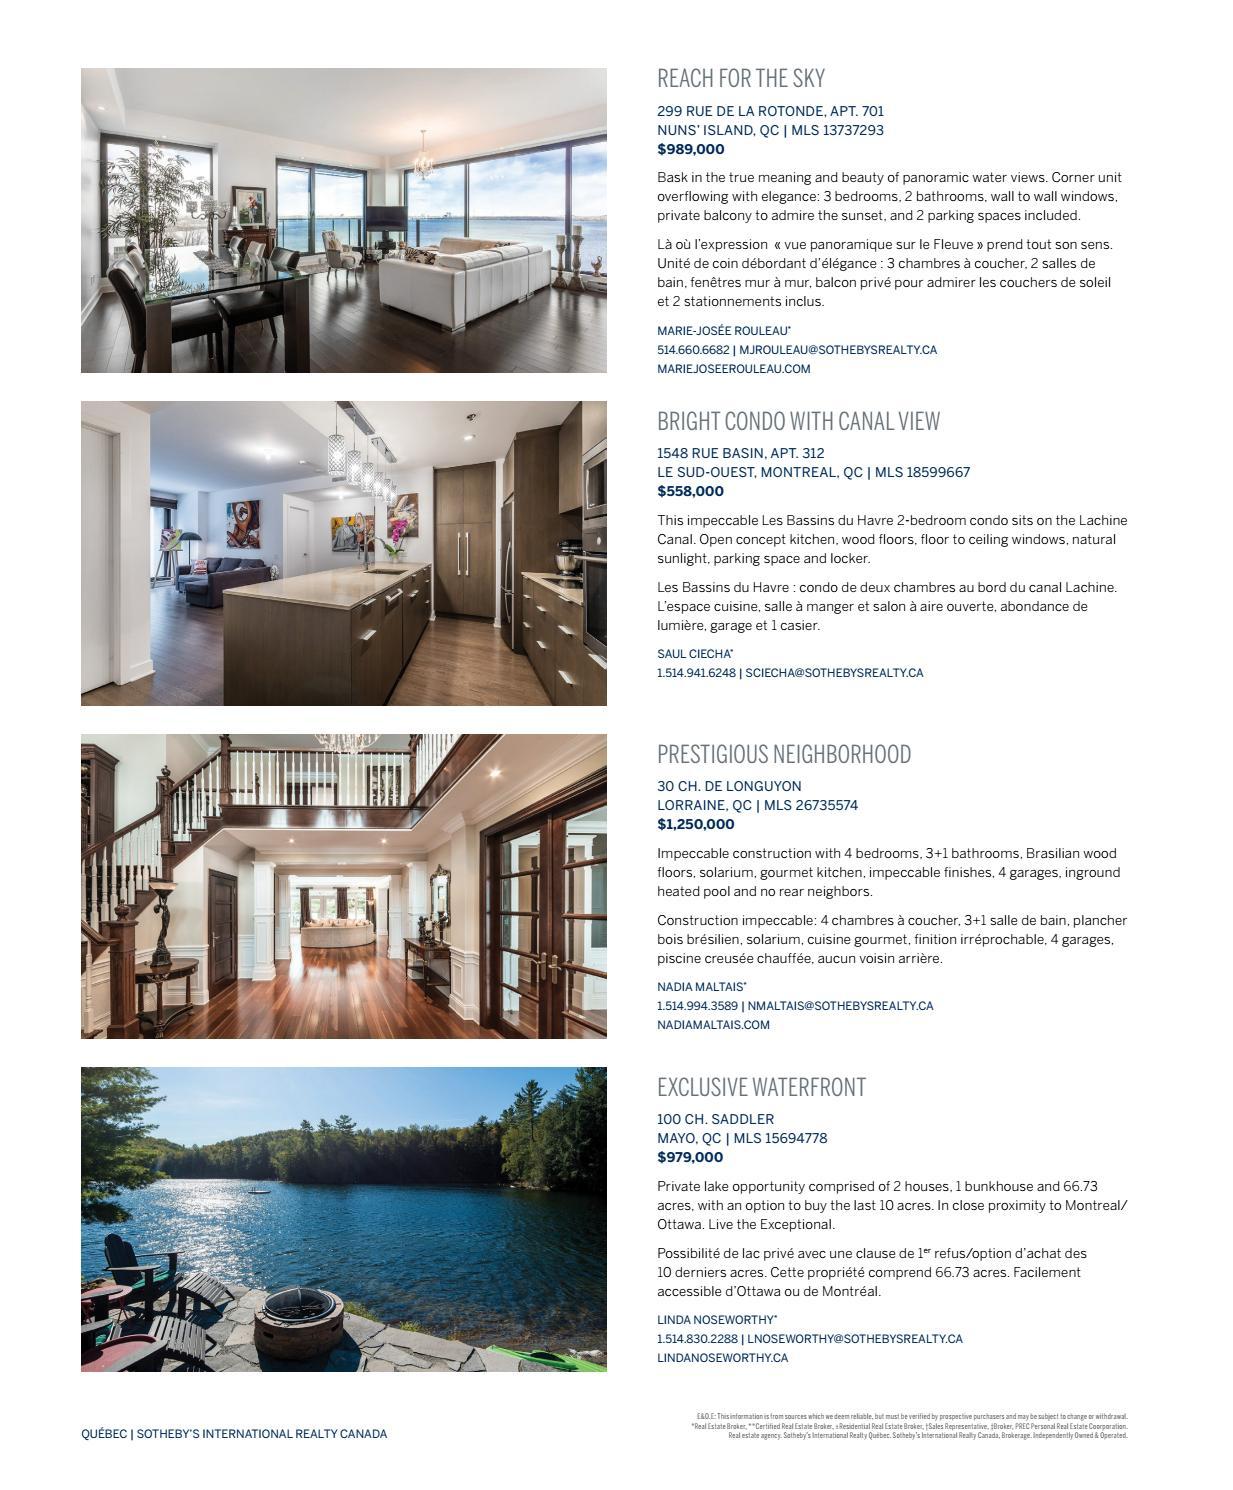 Salon Et Cuisine Aire Ouverte insight: the art of living spring 2019sotheby's